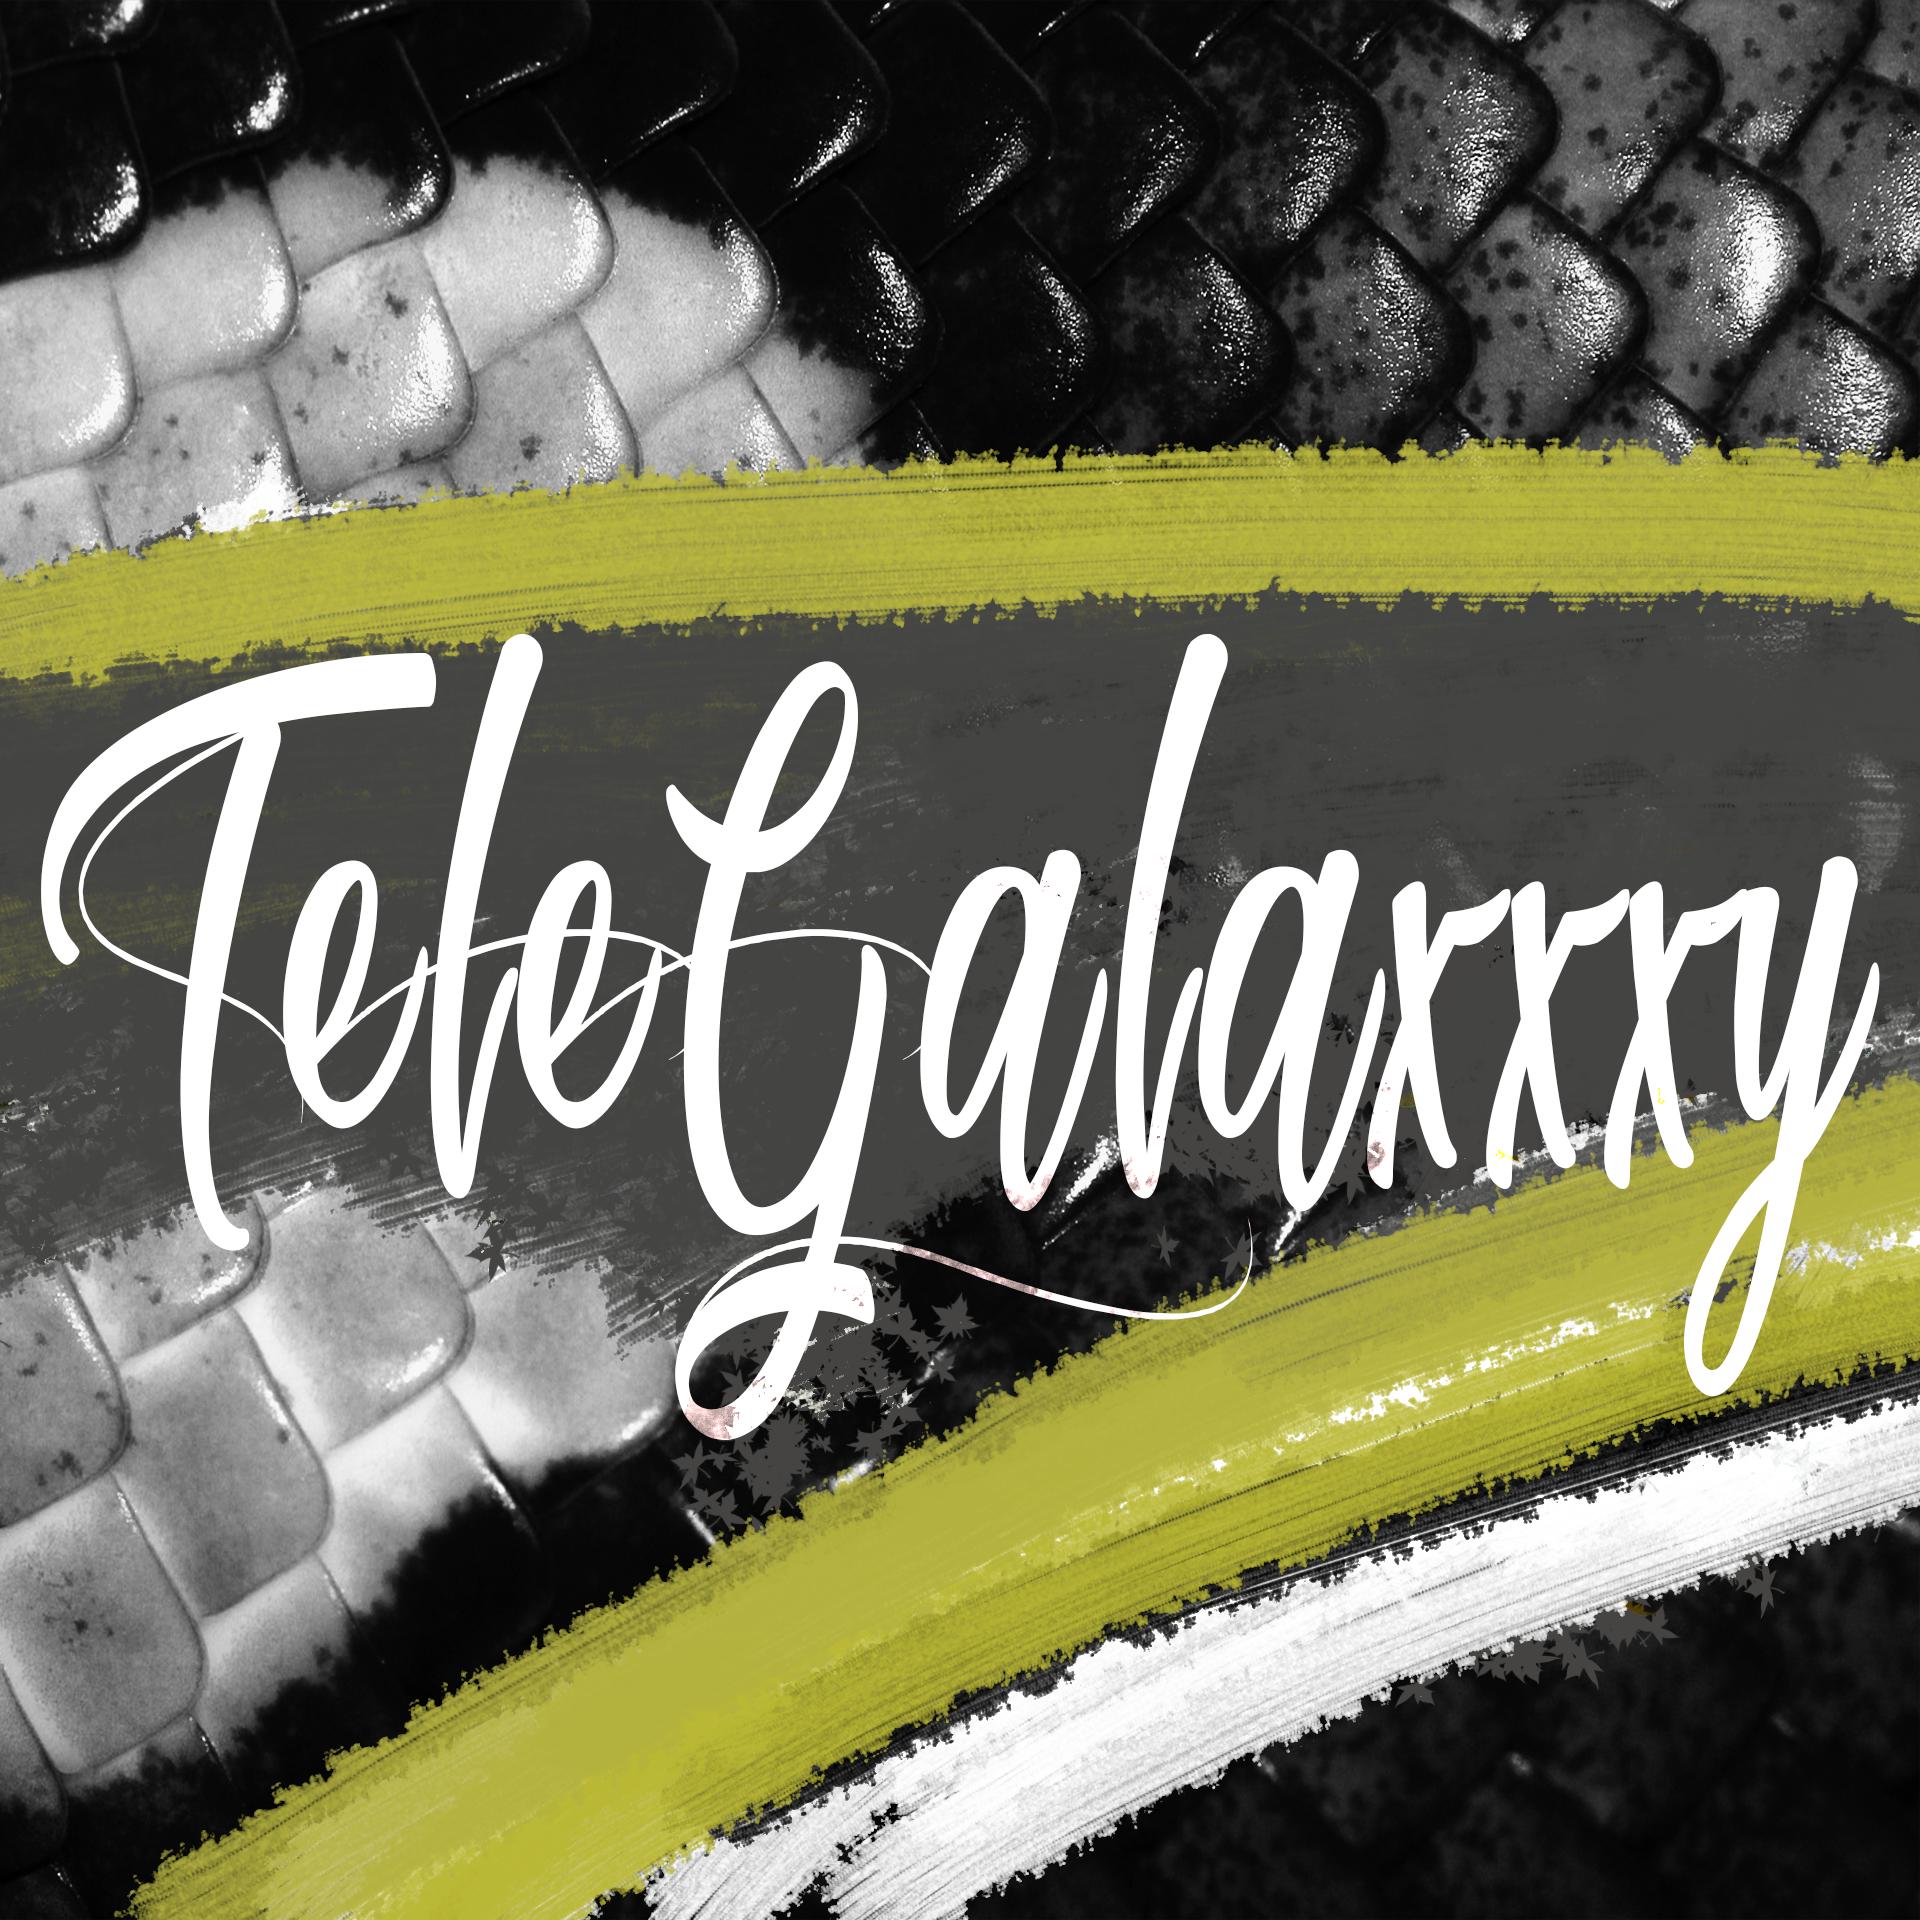 DSP019 TeleGalaxxxy - Le Serpent.jpg